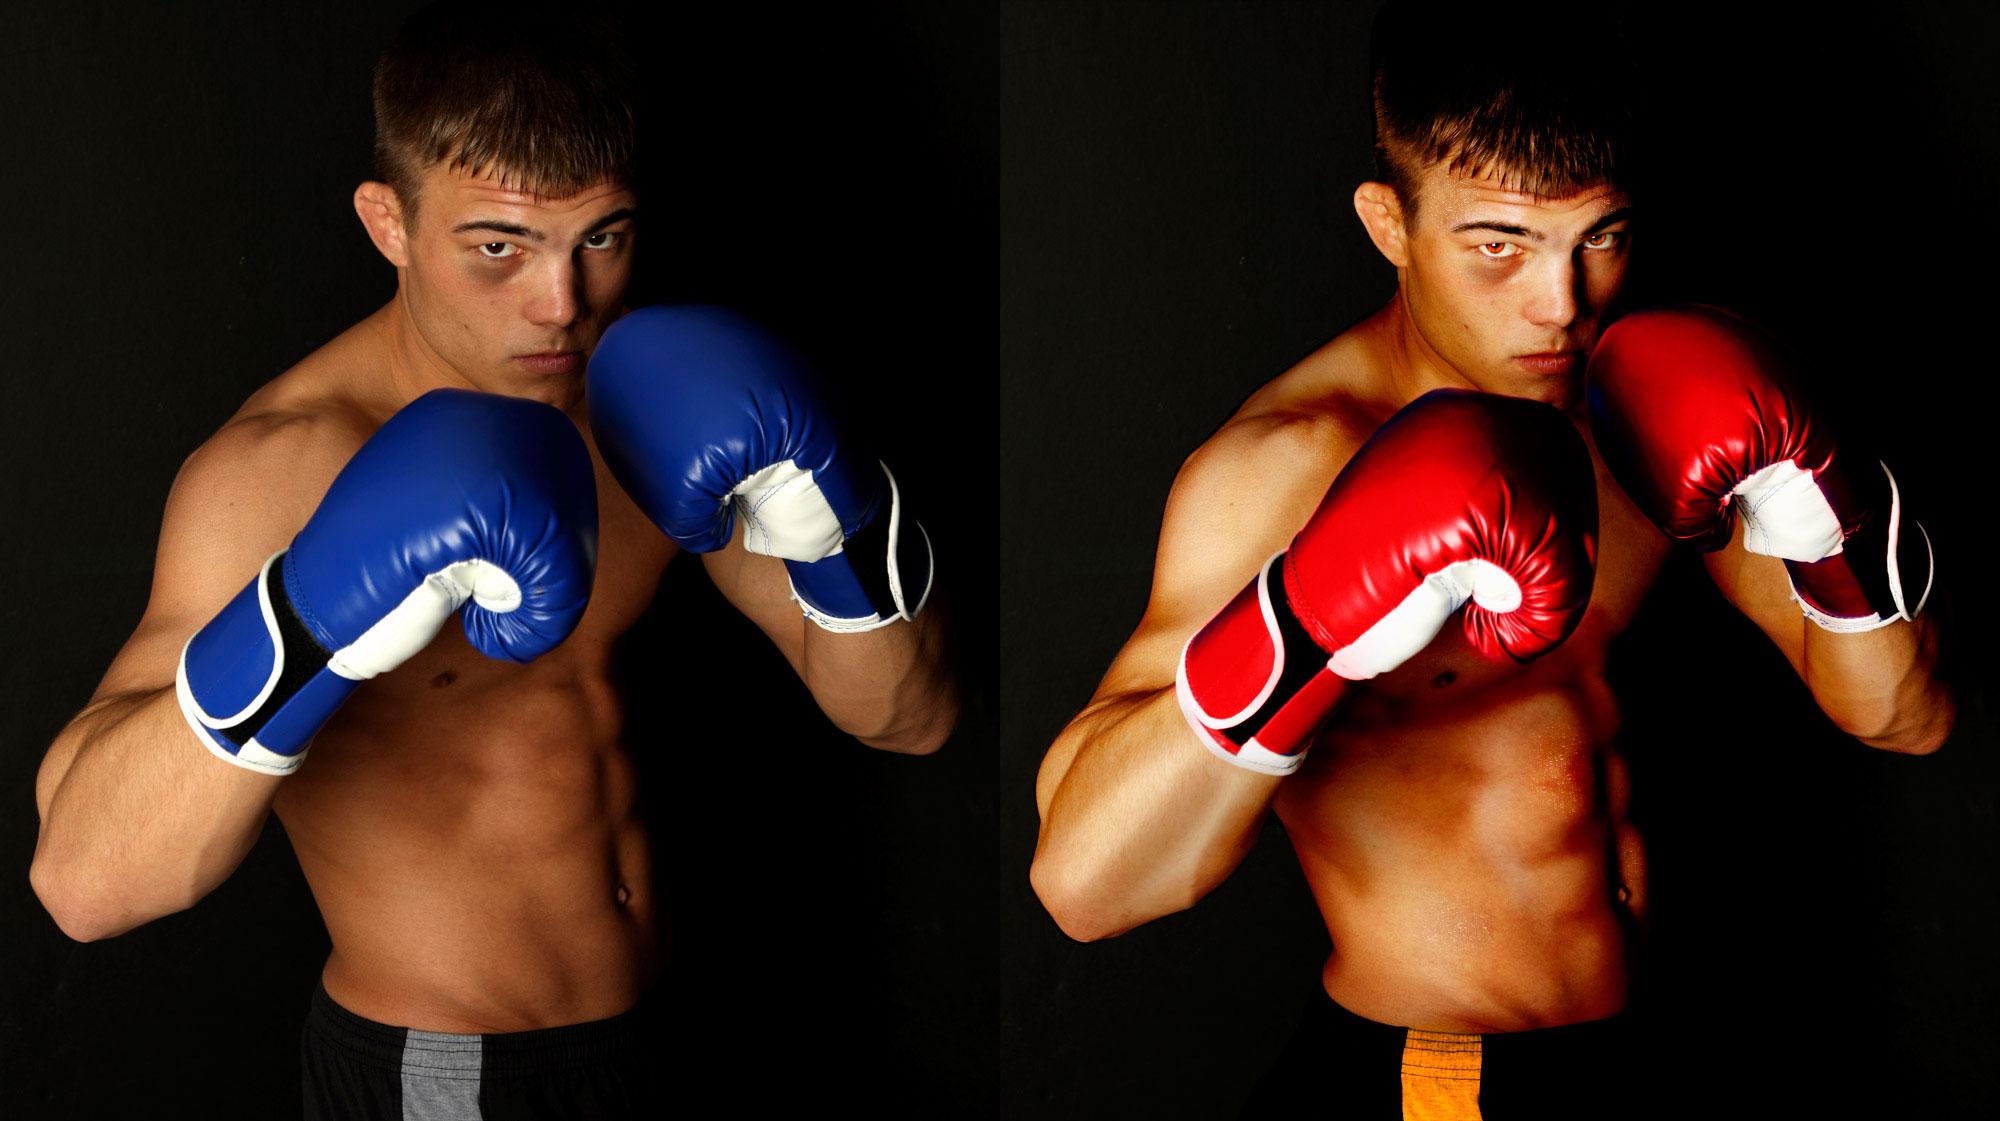 Original image and image edit to enhance boxer